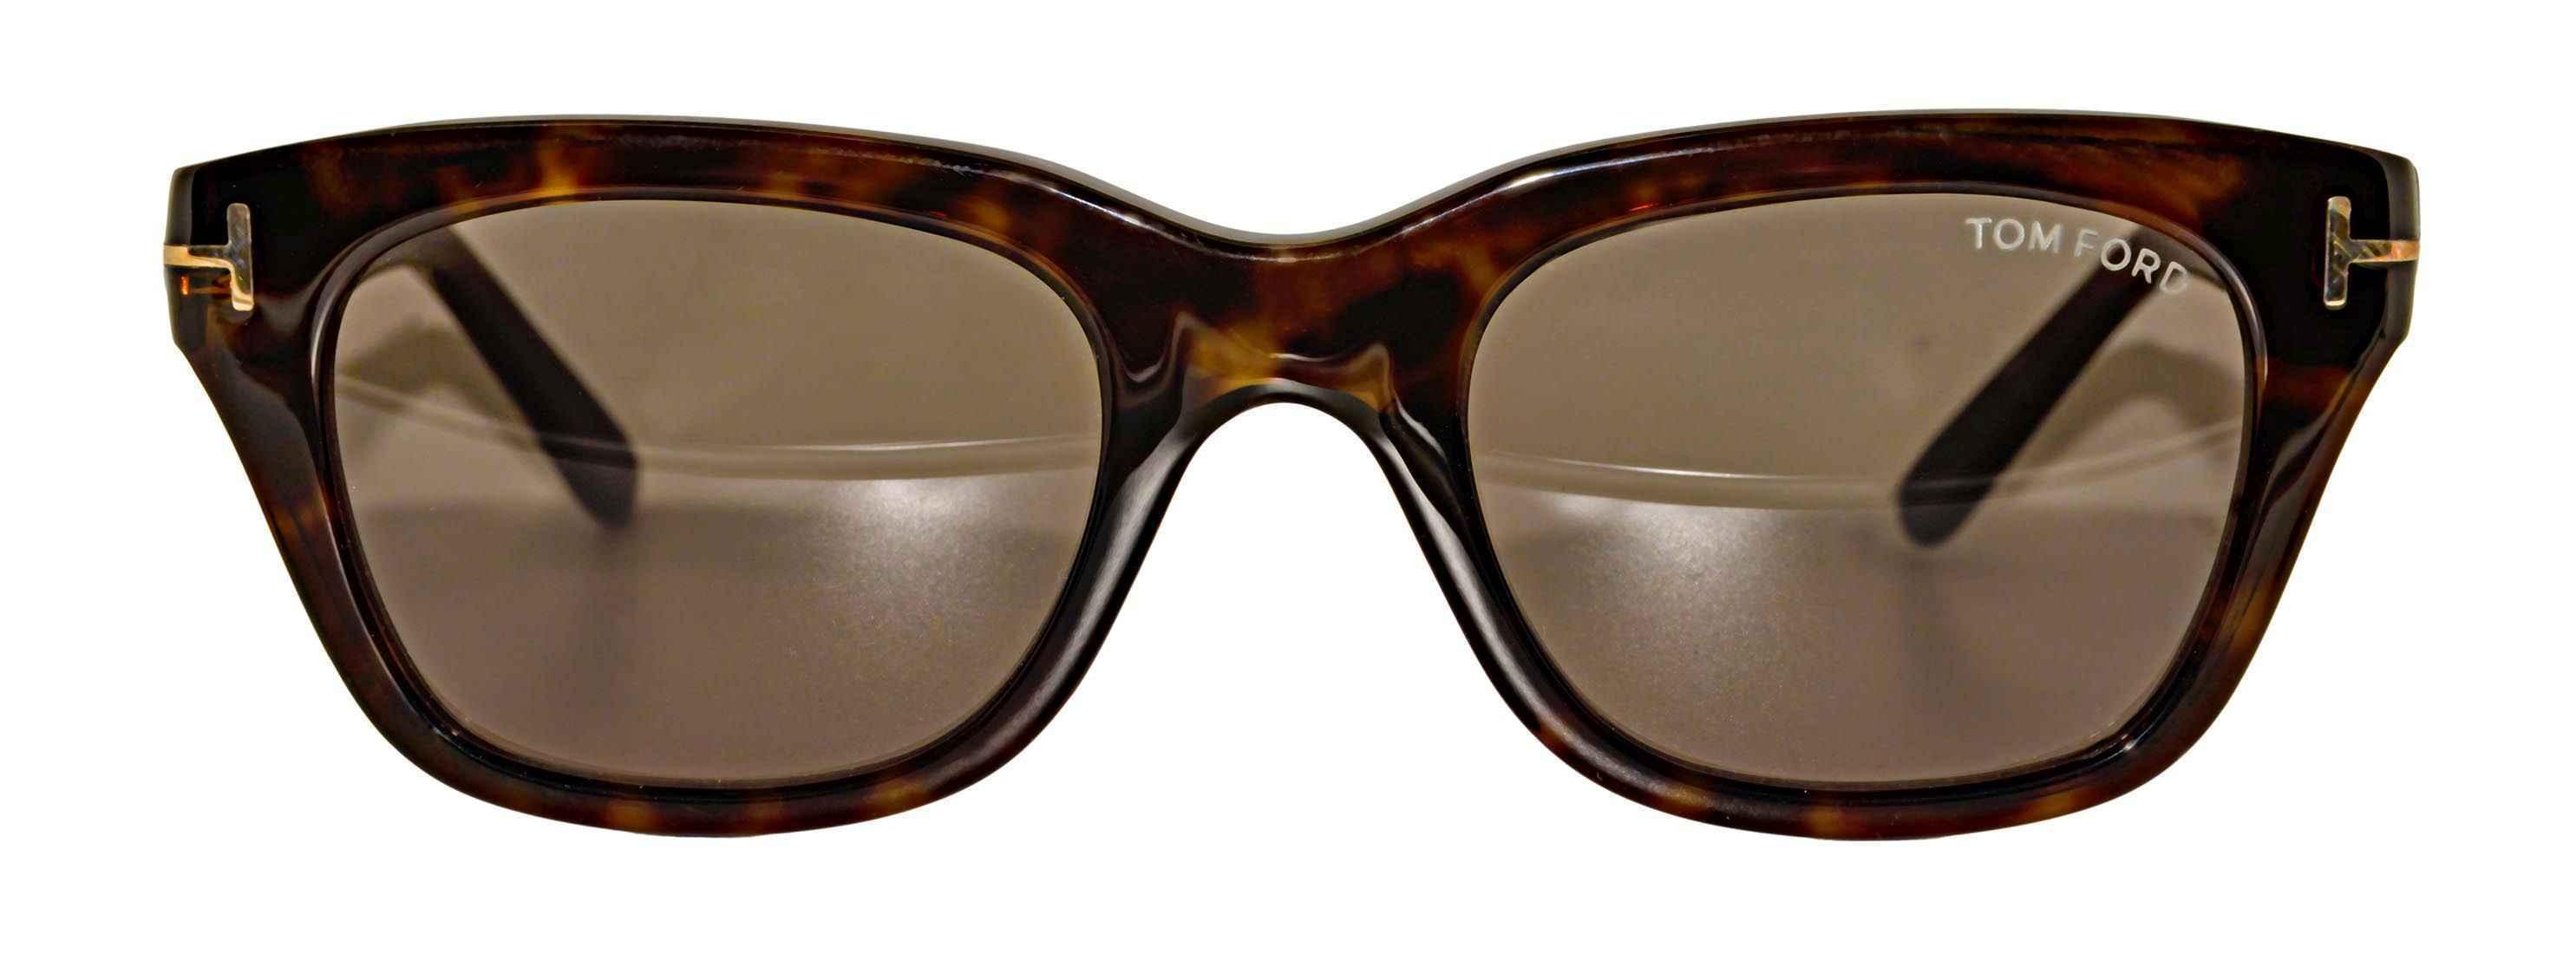 Tom Ford Sunglasses 237 52n 1 2970x1100